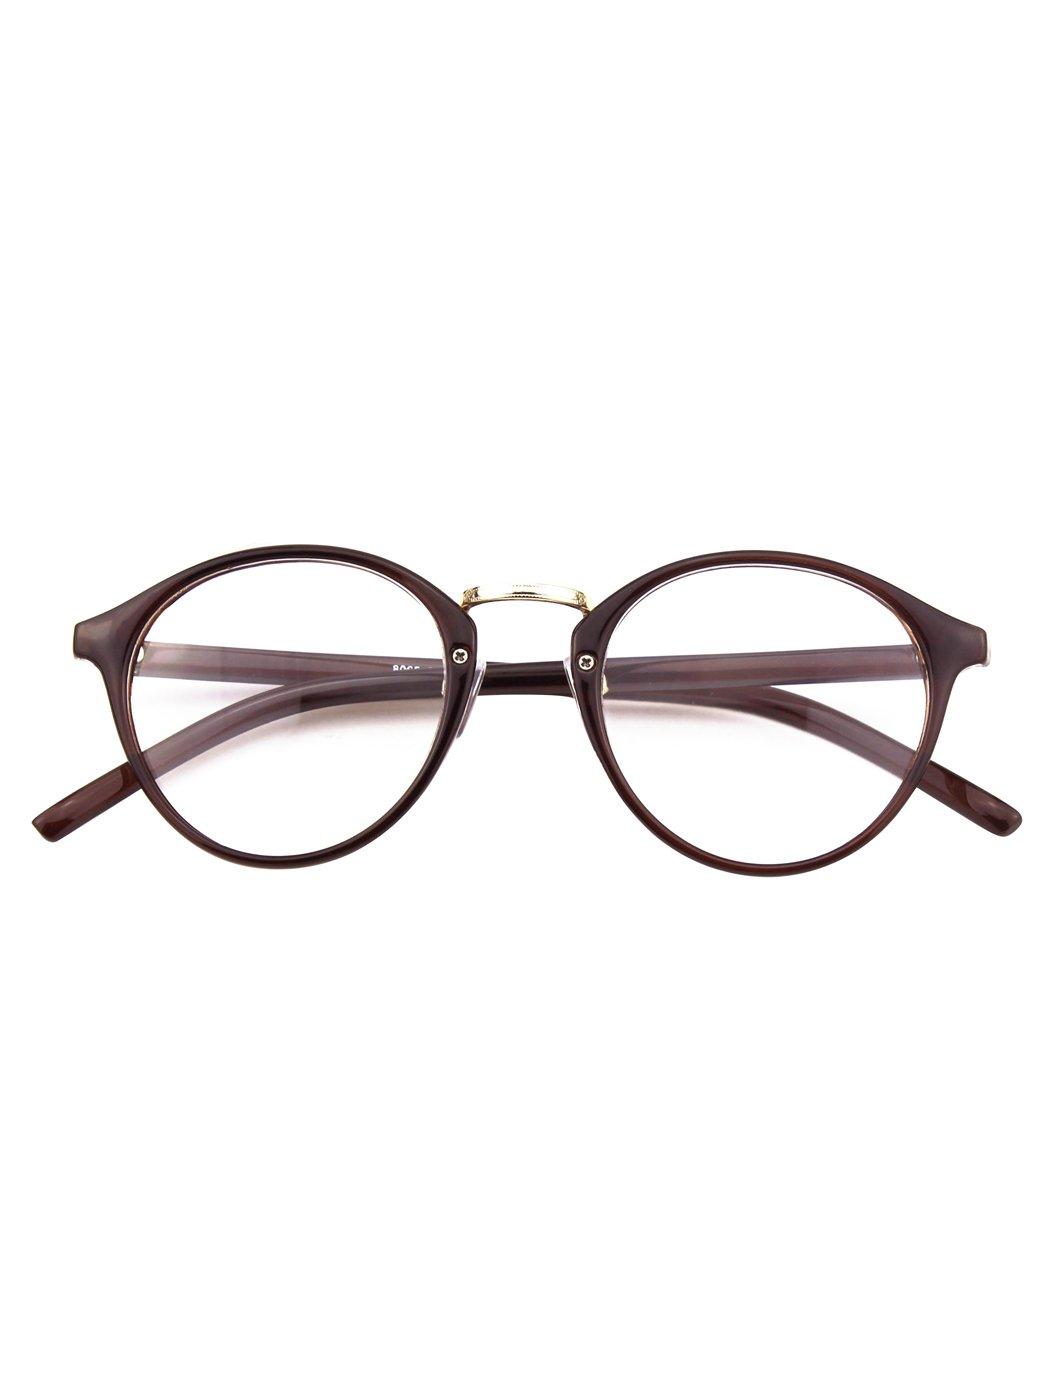 HAPPY STORE CN65-Vintage Inspired Classic Nerd UV 400 Clear Lens Glasses, Brown CGID N1411FBA65A1